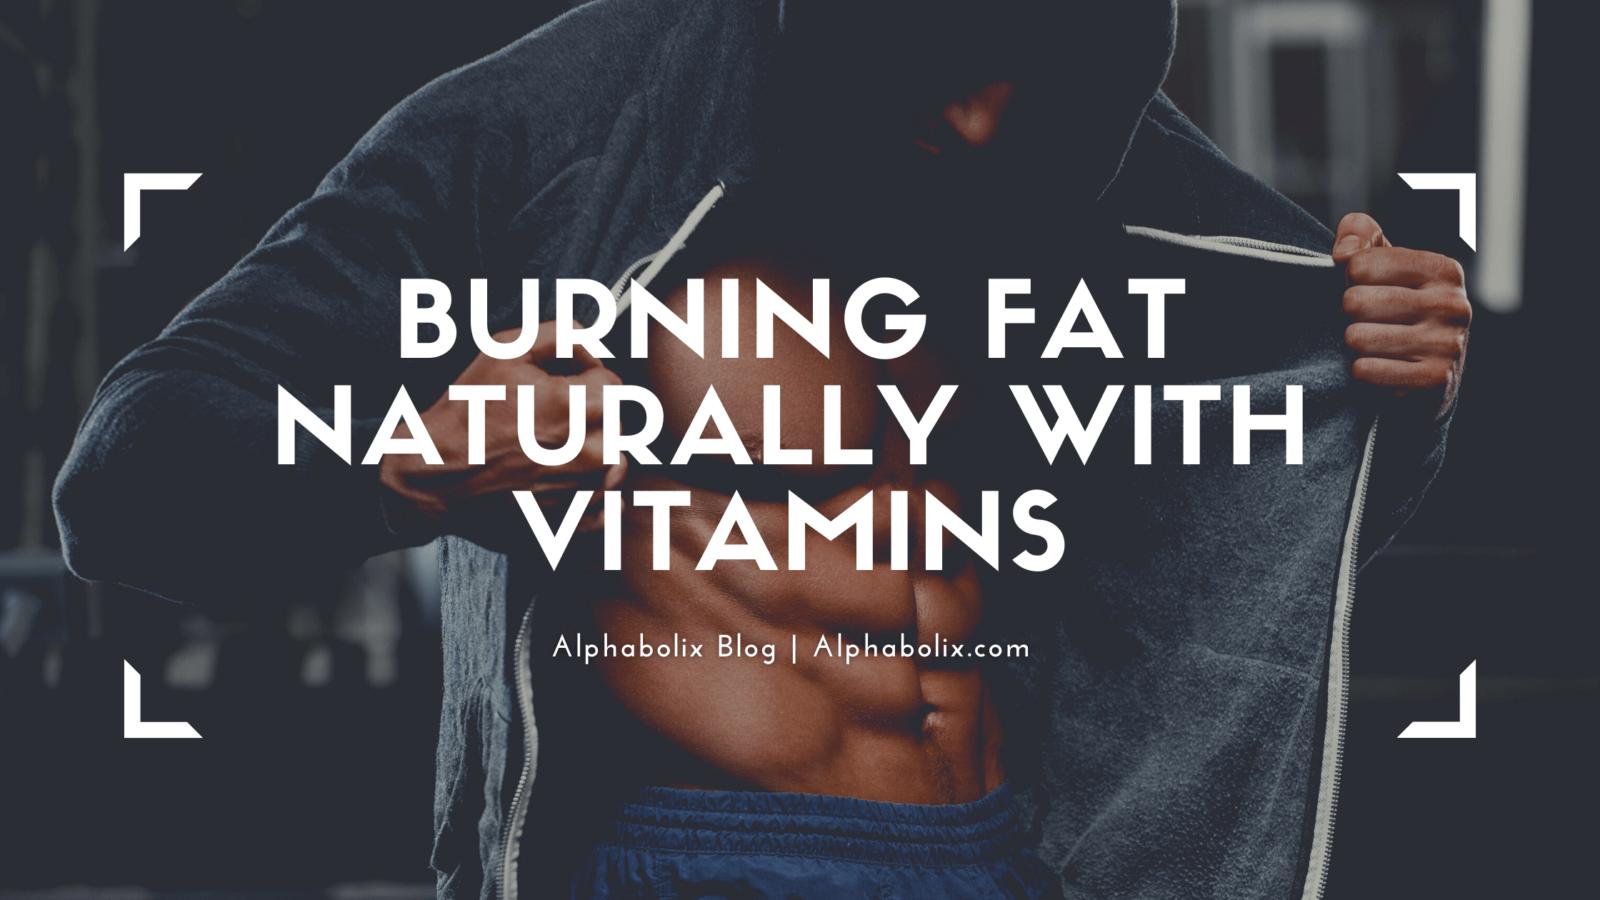 Burning Fat Naturally With Vitamins